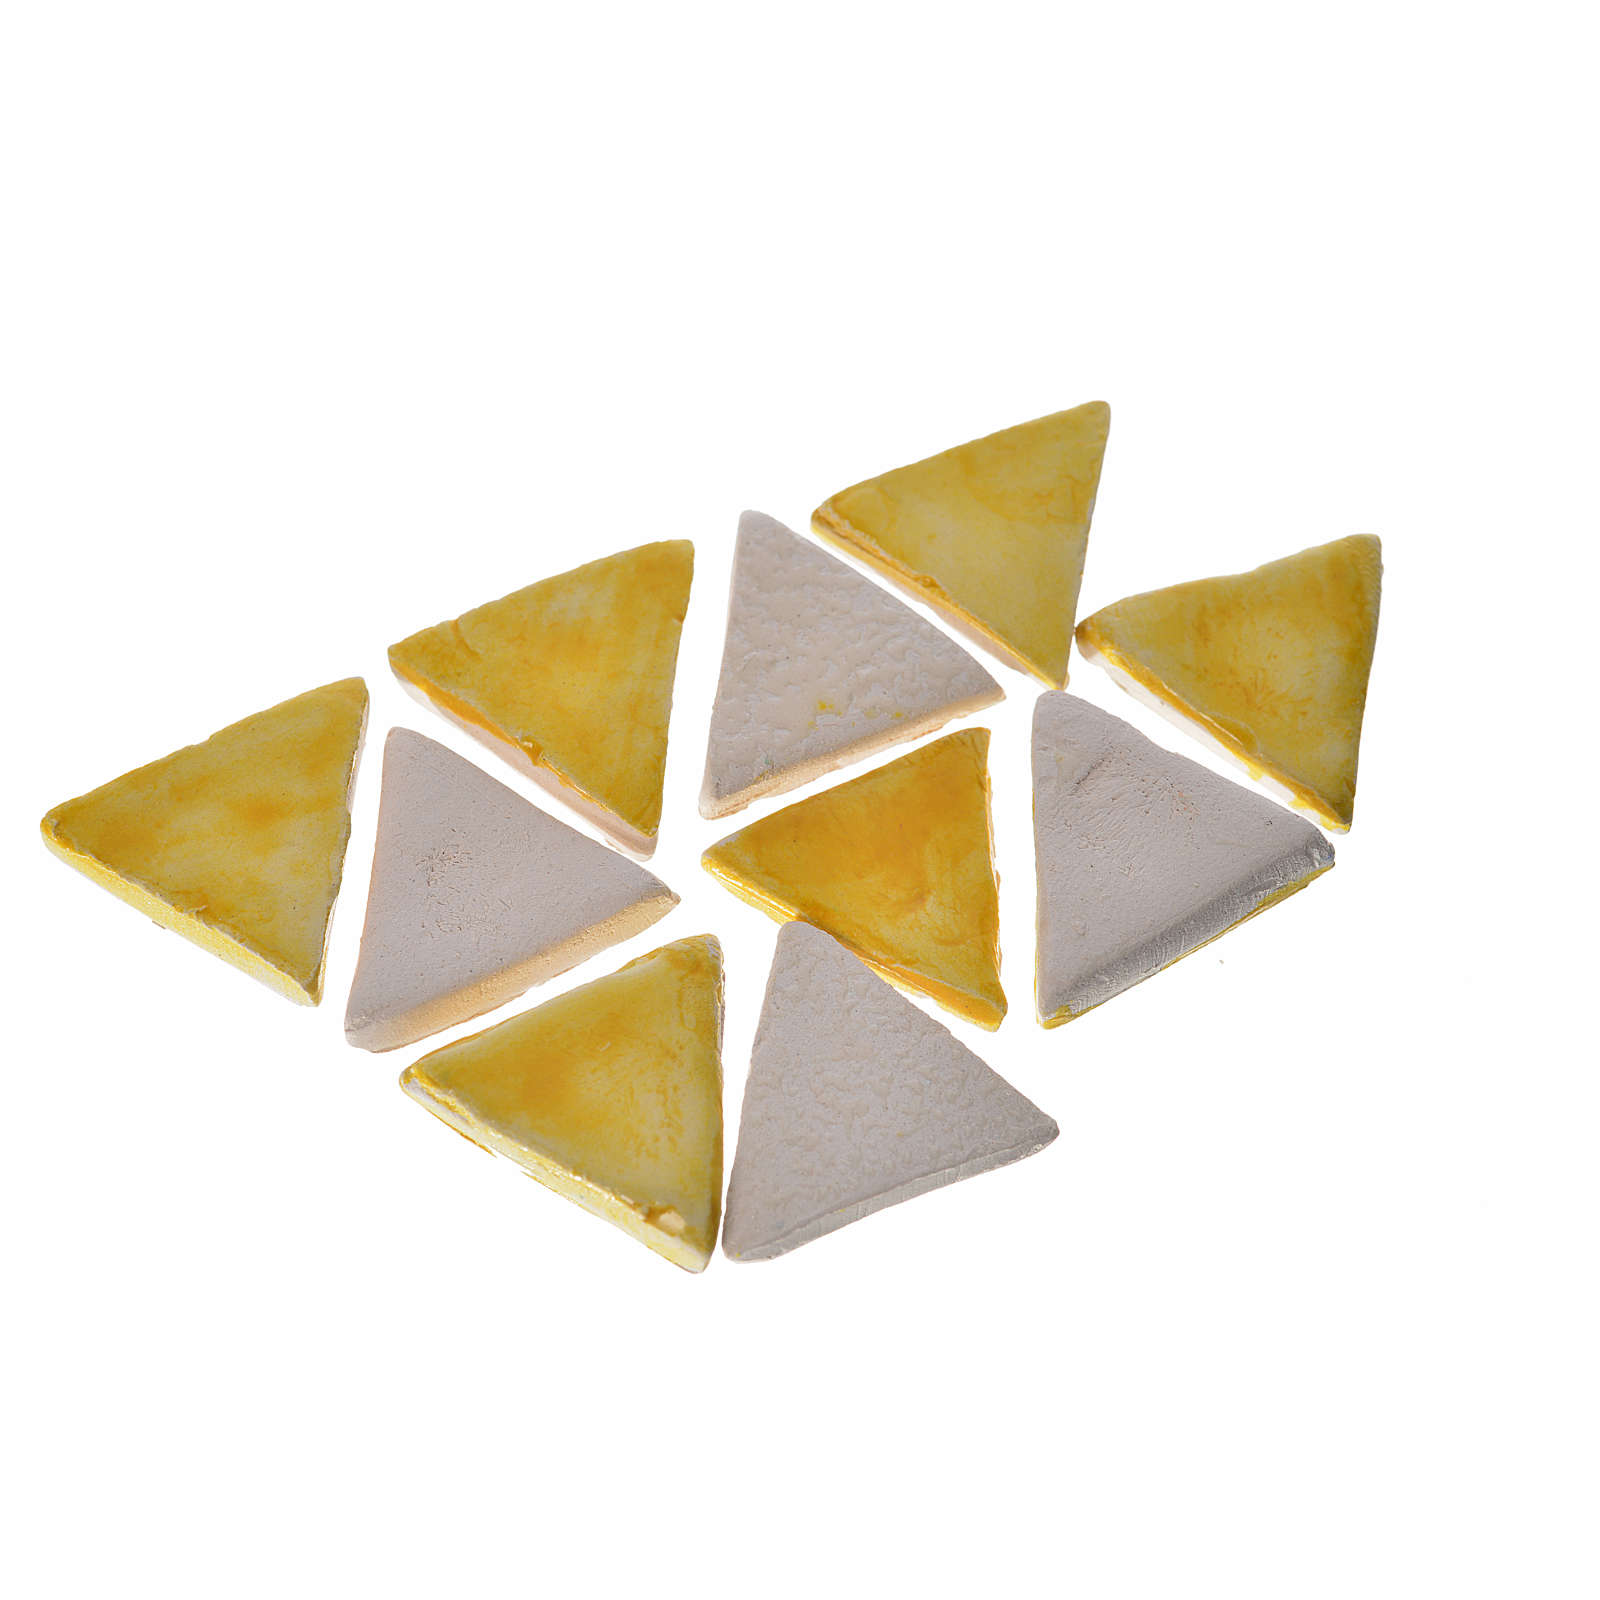 Nativity accessory, terracotta triangular tiles with enamel 60pc 4